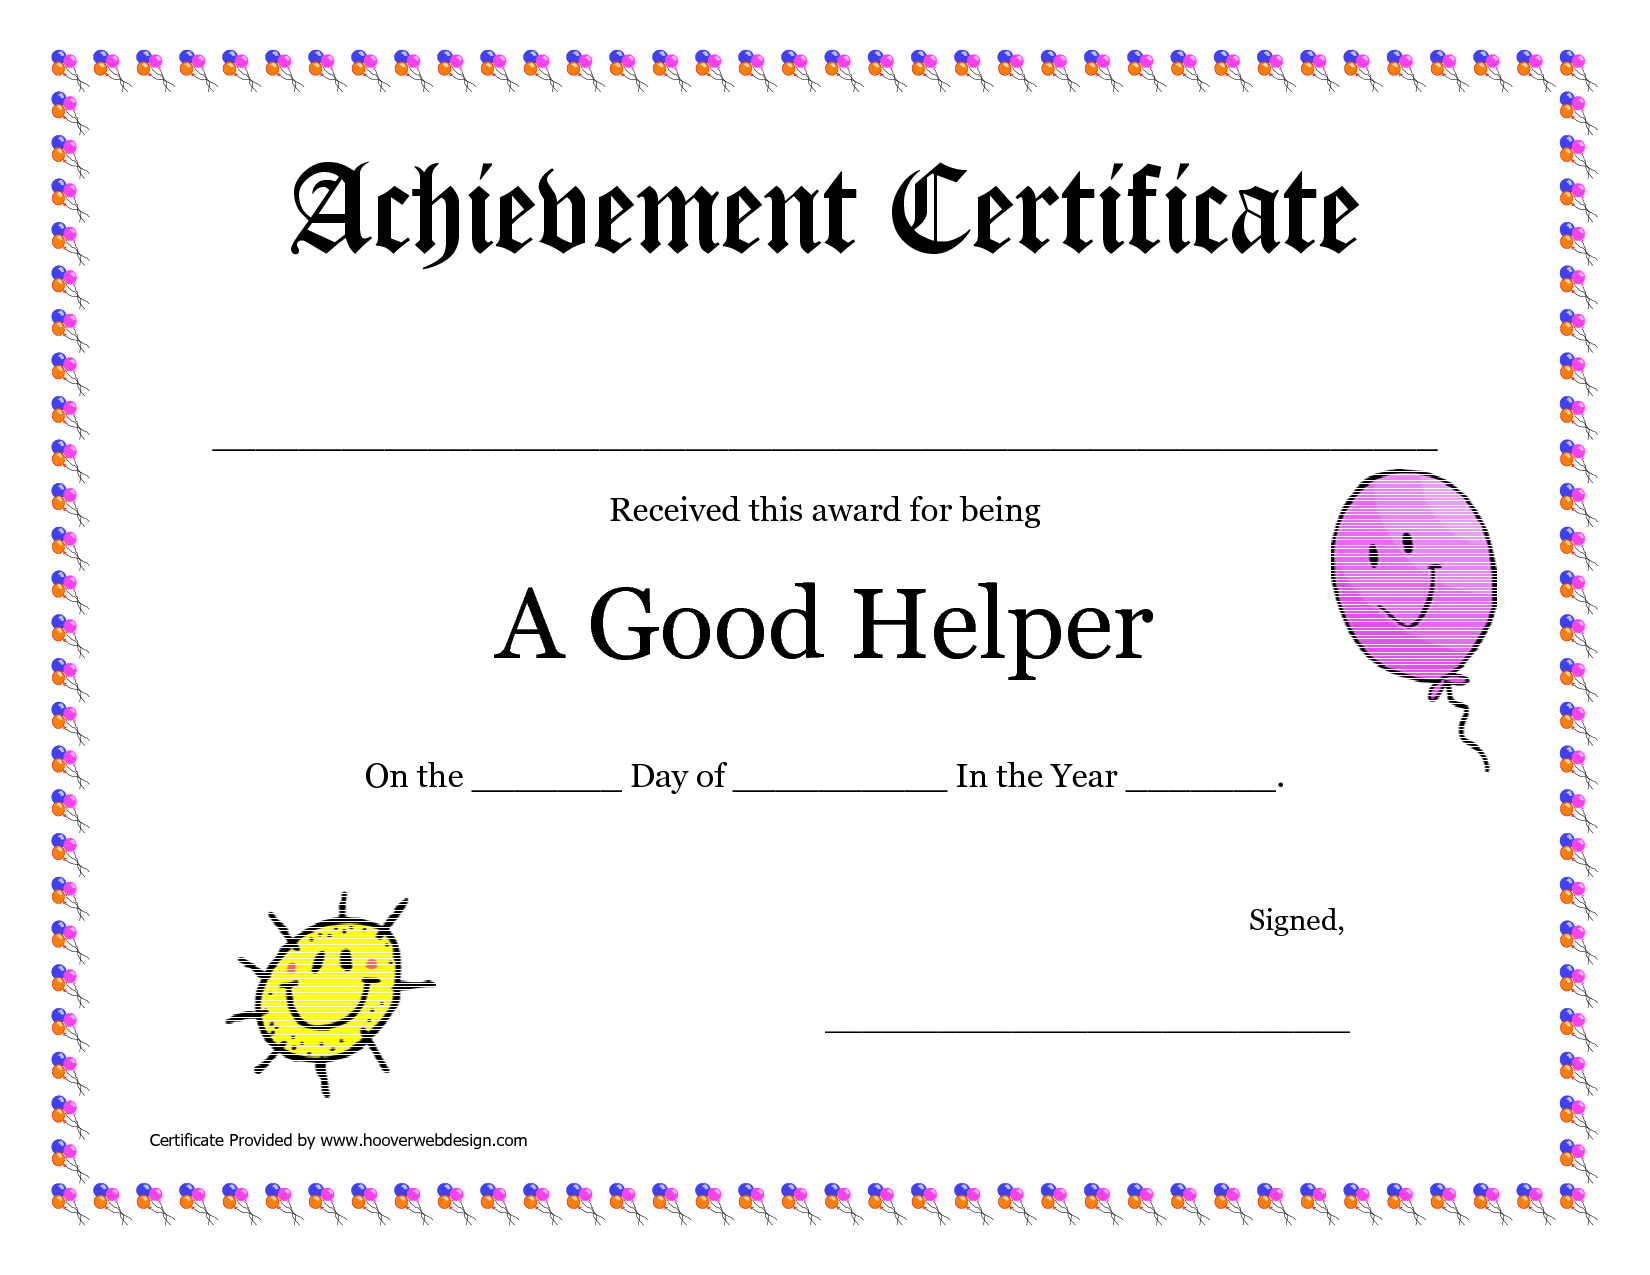 Printable Award Certificates For Teachers | Good Helper Printable - Free Printable Award Certificates For Elementary Students